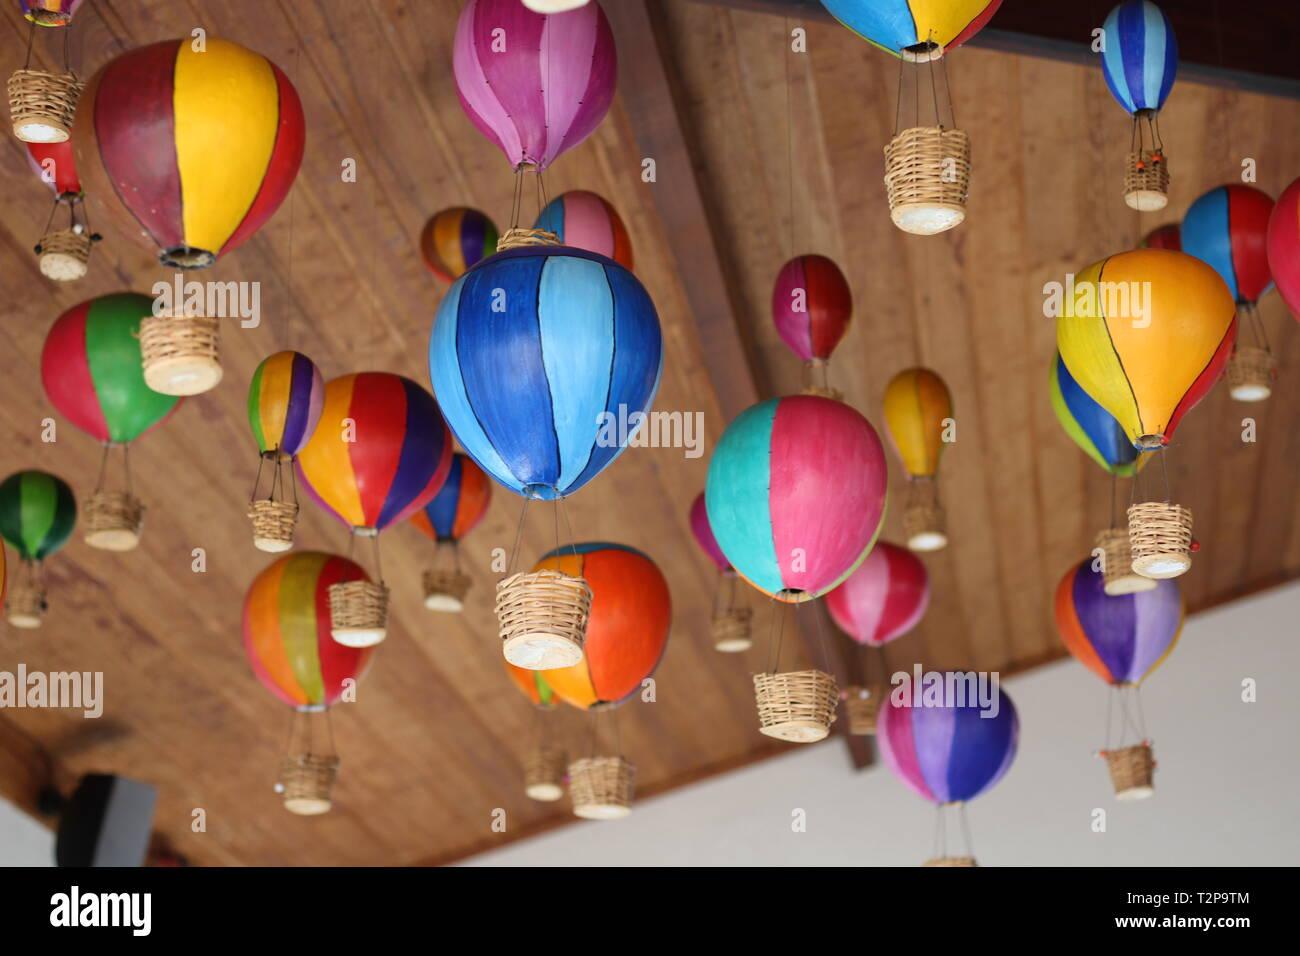 Cielo de madera Imagen De Stock